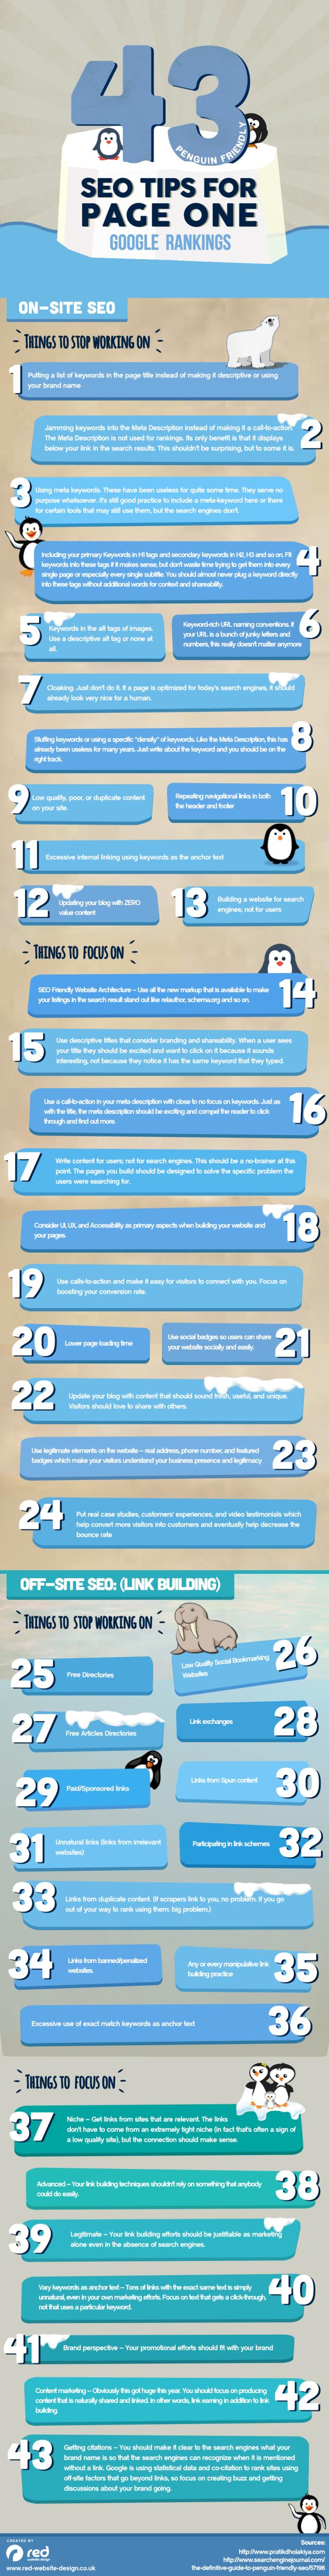 43 consejos SEO